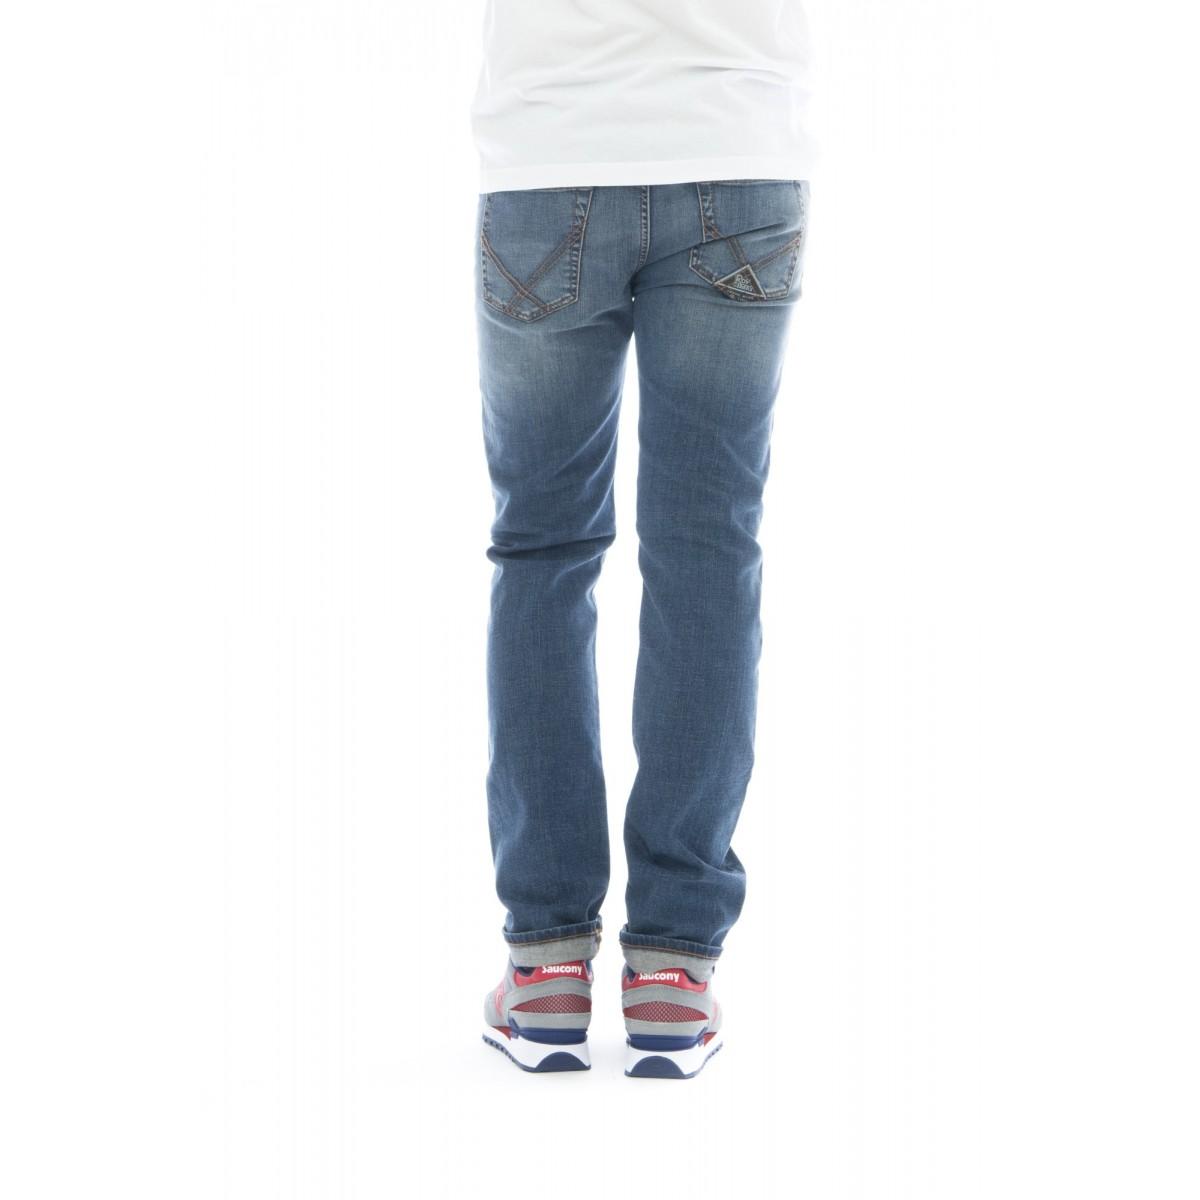 Jeans Man In Sand-Wash Stretch Denim- 529 WEARED 10